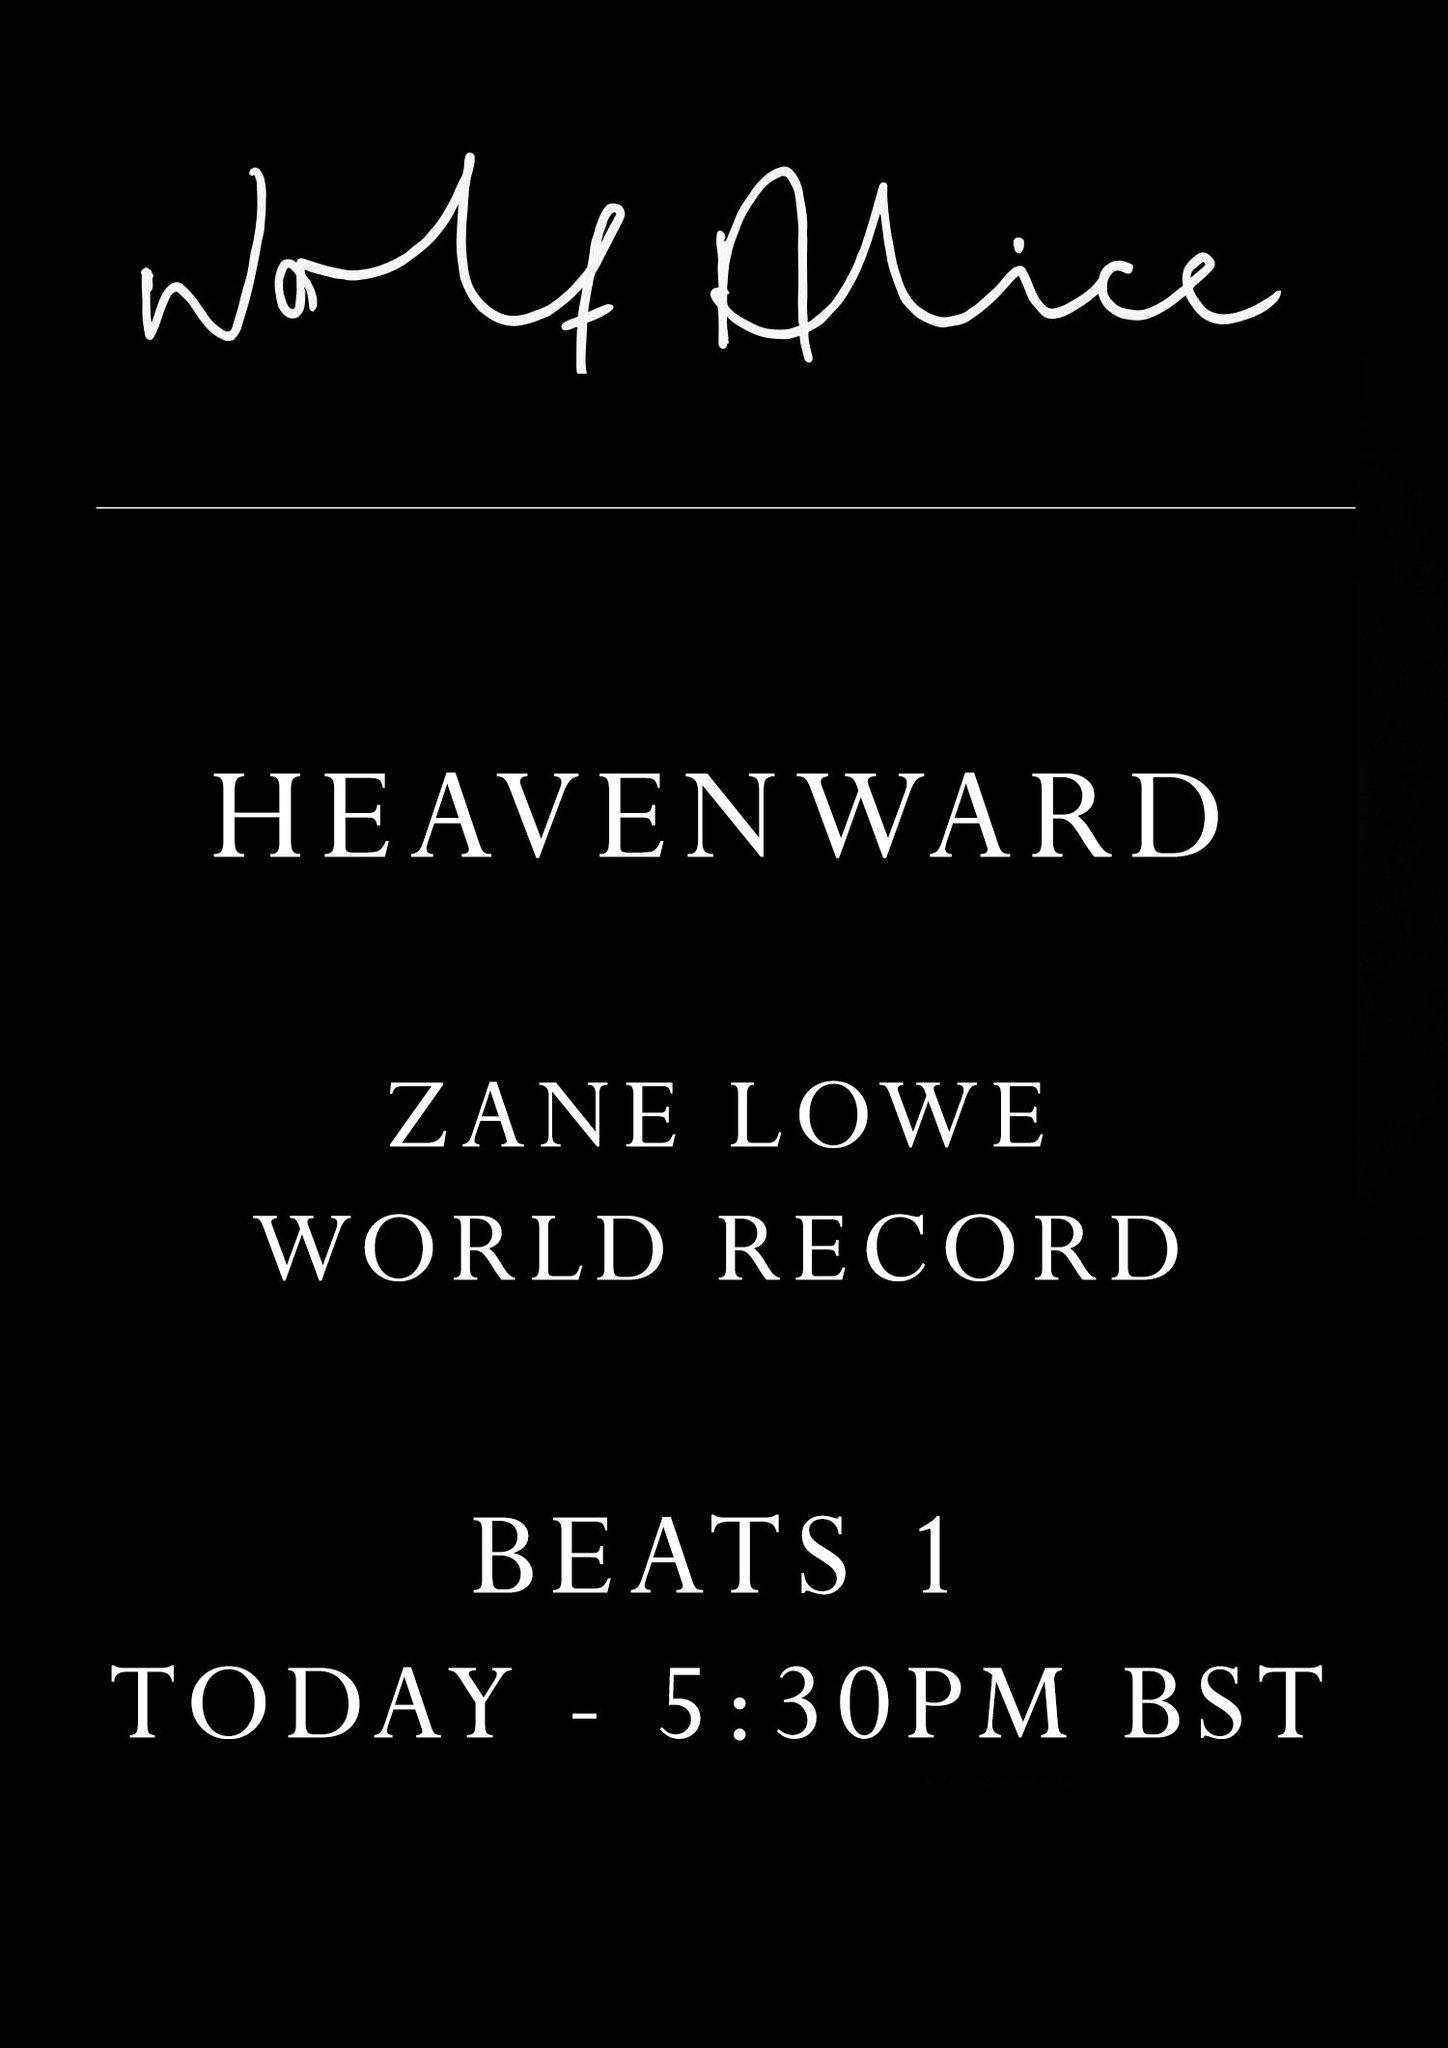 RT @wolfalicemusic: Heavenward @Beats1 @zanelowe Today 5:30PM BST - https://t.co/Z6mJq6ZUSX https://t.co/4r8QZJOlF2